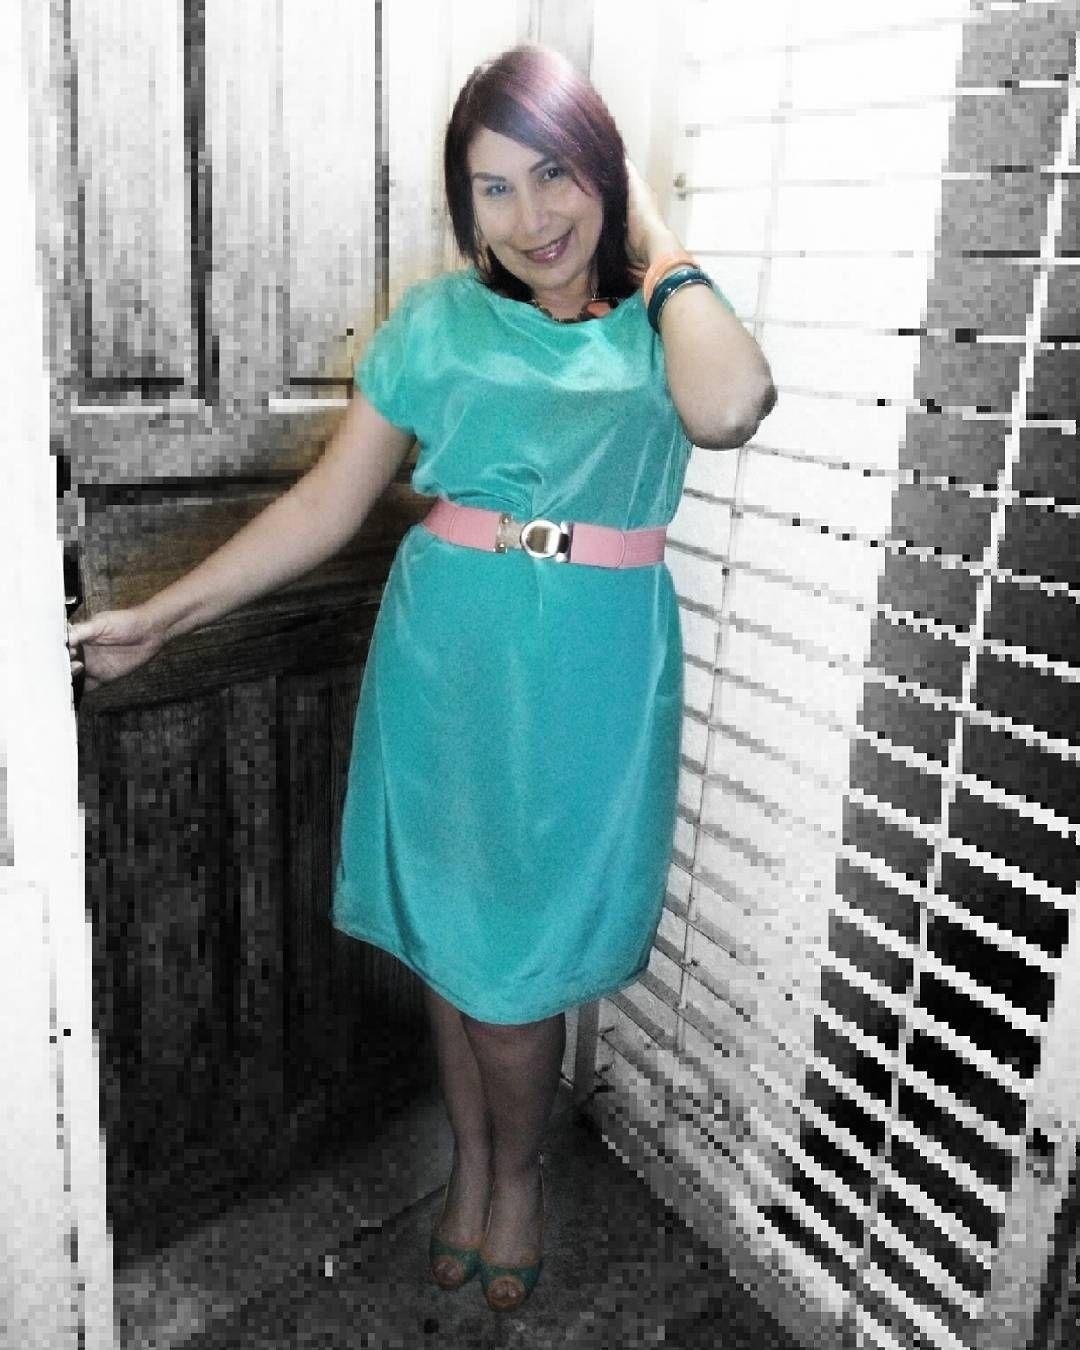 Así quedó mi vestido  #dress #sewing #sew #dressoftheday #vestido #sewingmachine #sewingproject #singermachine #me #diseñador #picoftheday #picture #fotografia #work #trabajo #hobbylobby #hobby #patronaje #patterndesign #pattern #sewcialists #sewcute